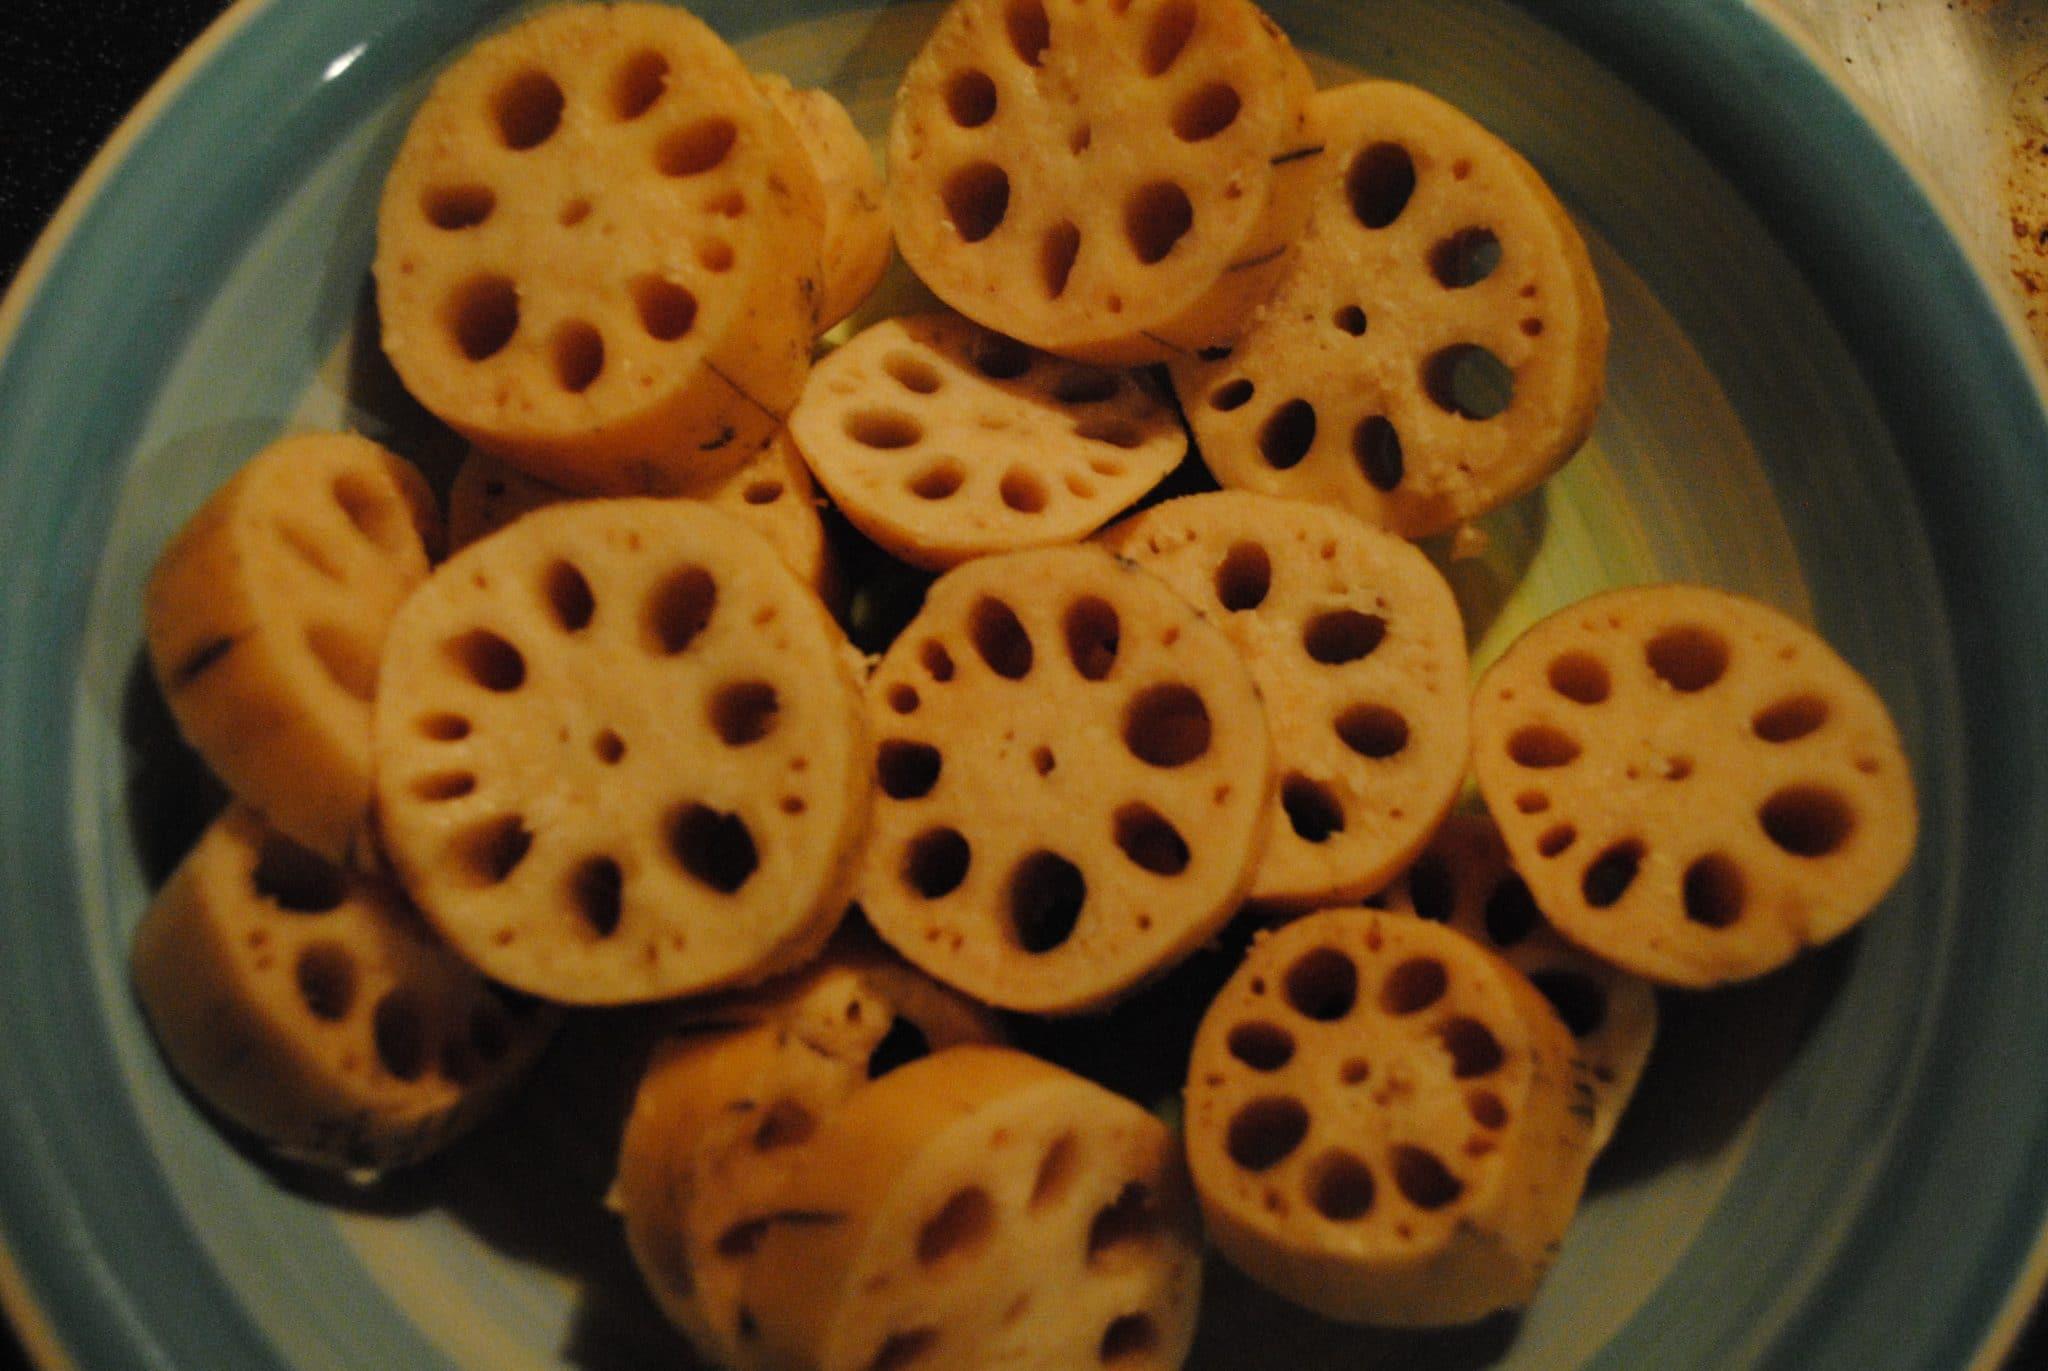 vegetable snack, vegetable snack recipe